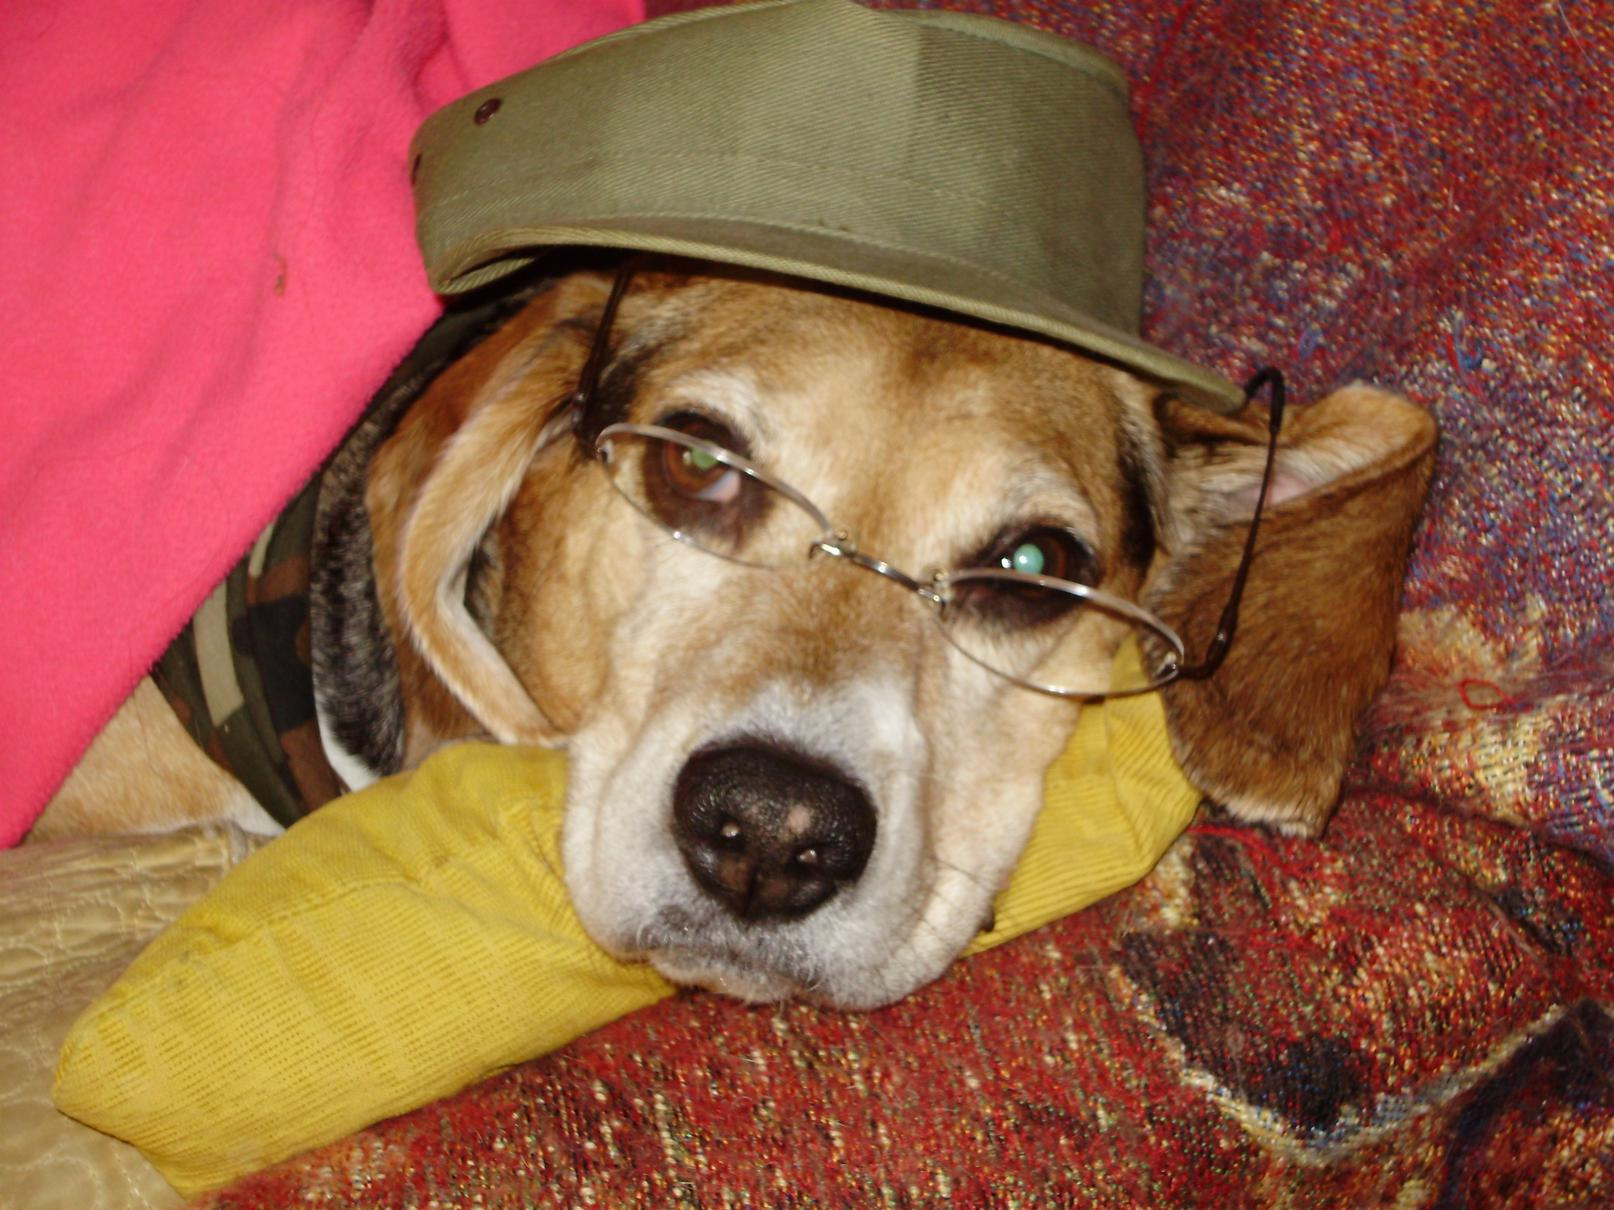 Sir Sam of Willenbaker-sam-army-hat.jpg